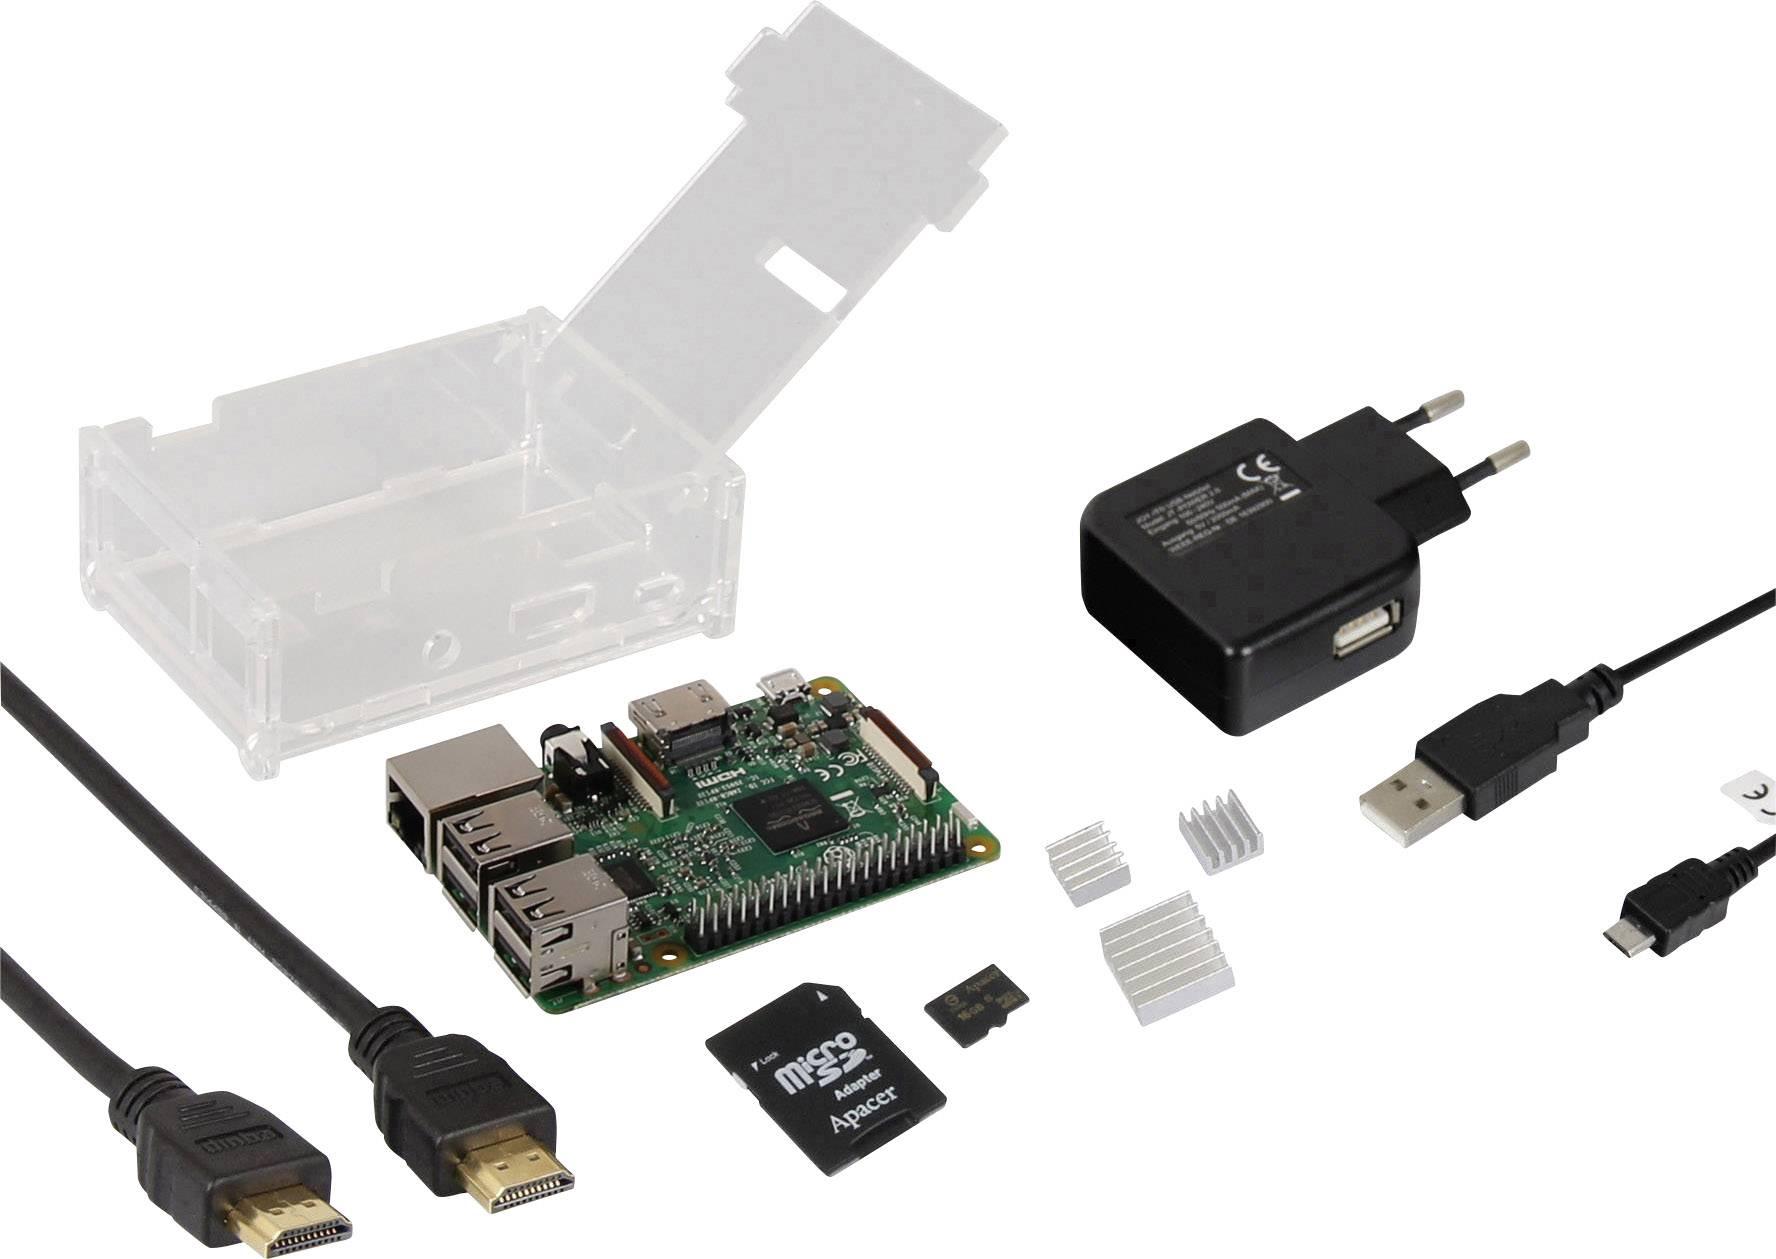 Startovní sada pro Raspberry Pi® 3 Model B, 1 GB, Linux, OS Noobs